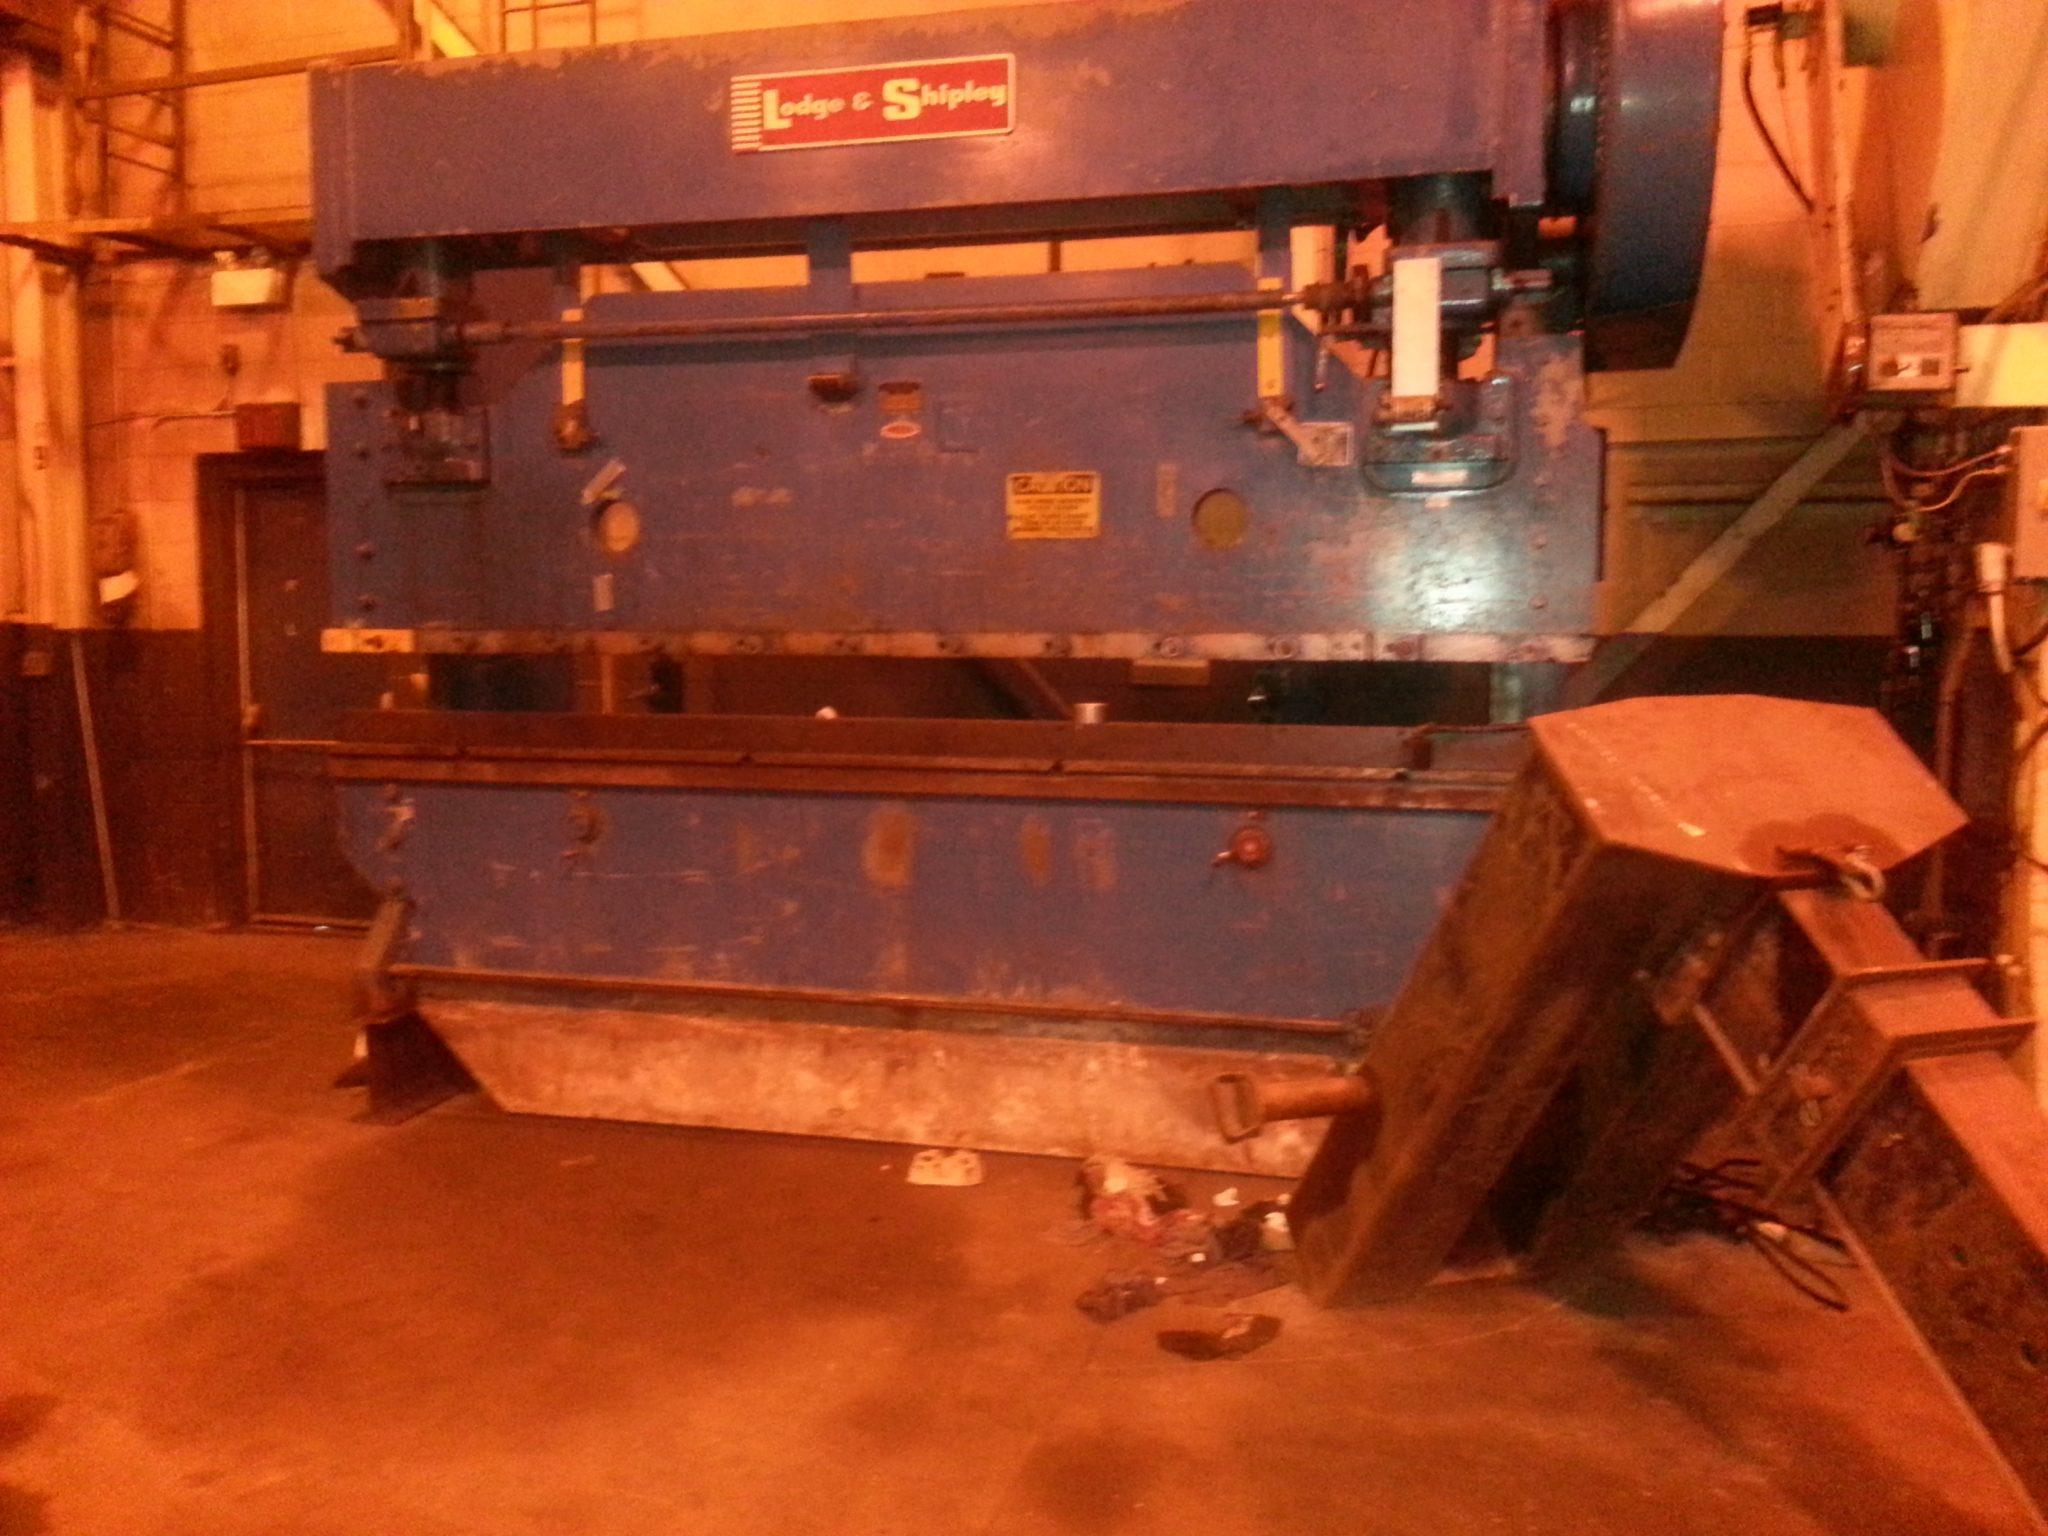 Lodge and Shipley Press Brake 3